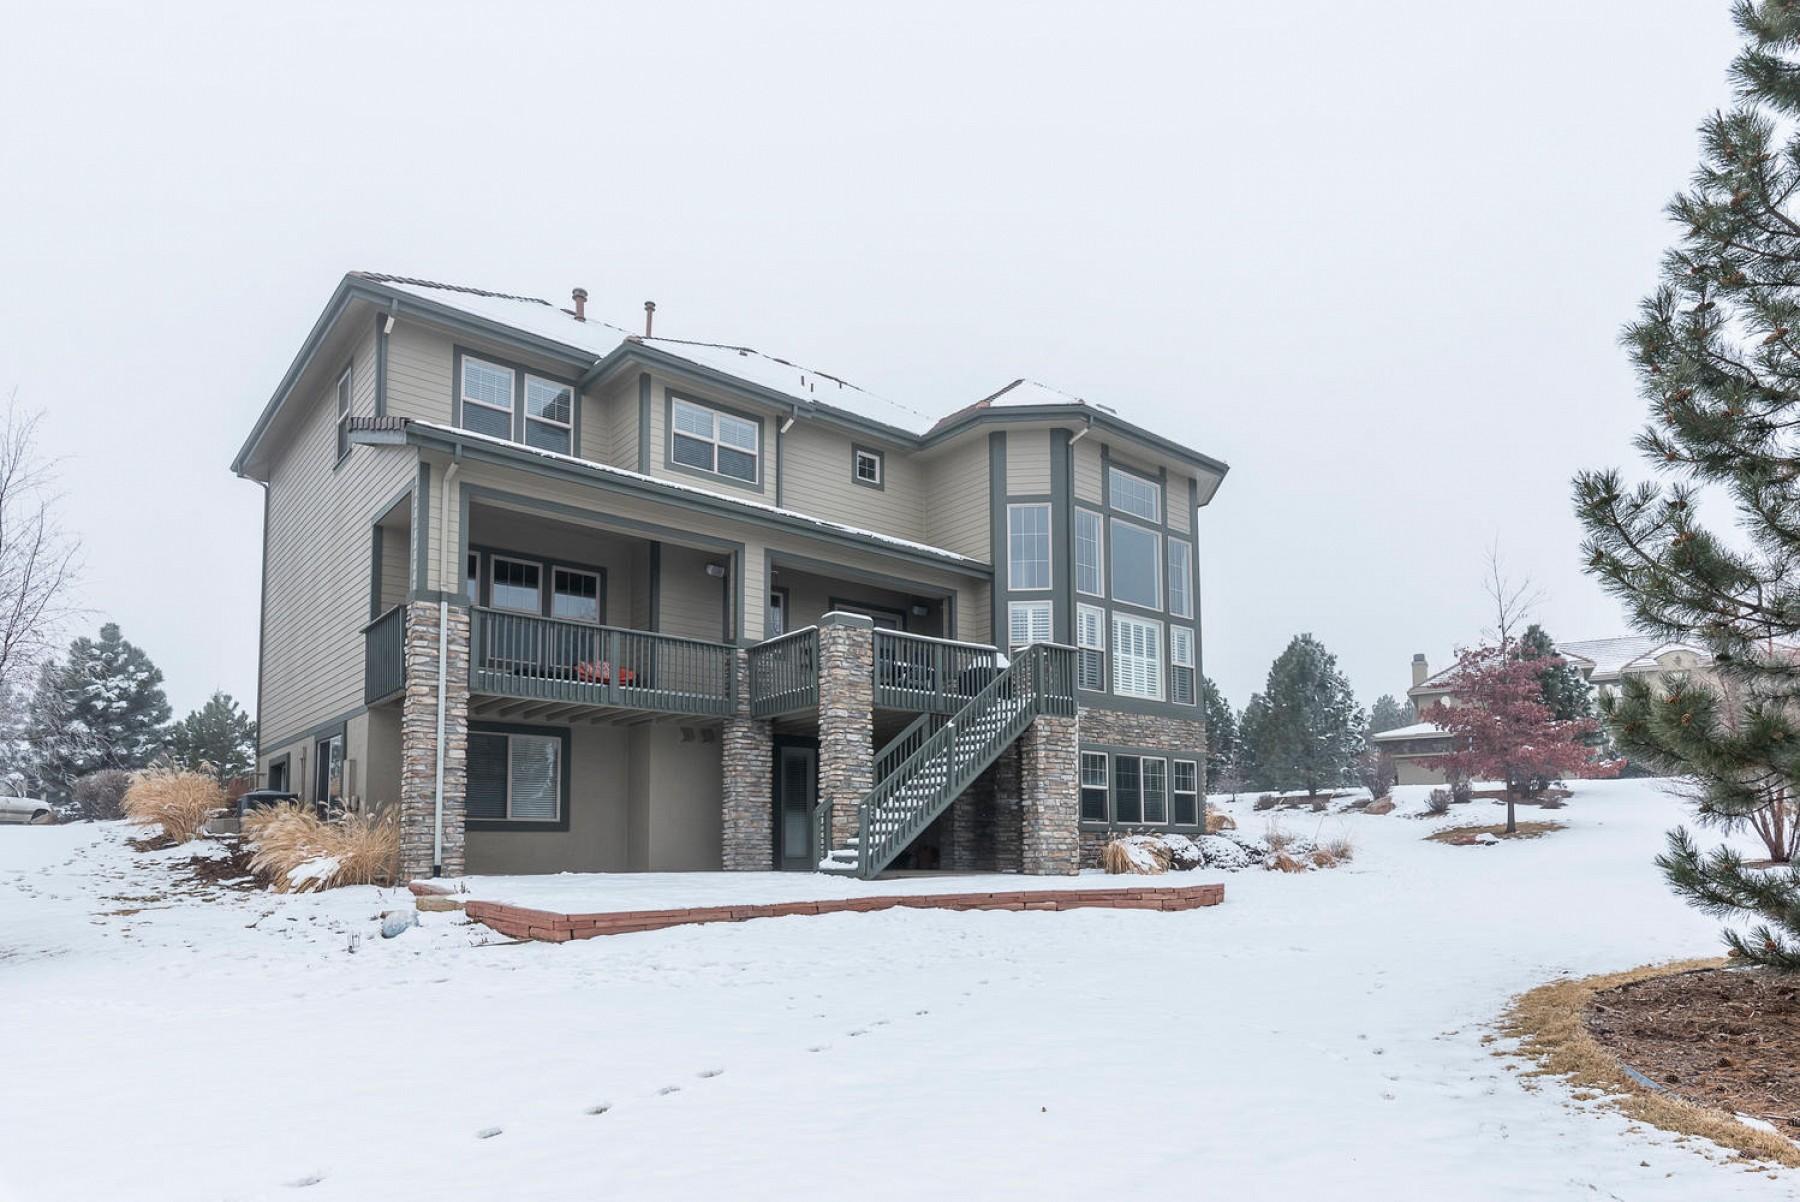 6241 Mt.Sneffels Place, Castle Rock, CO 80108